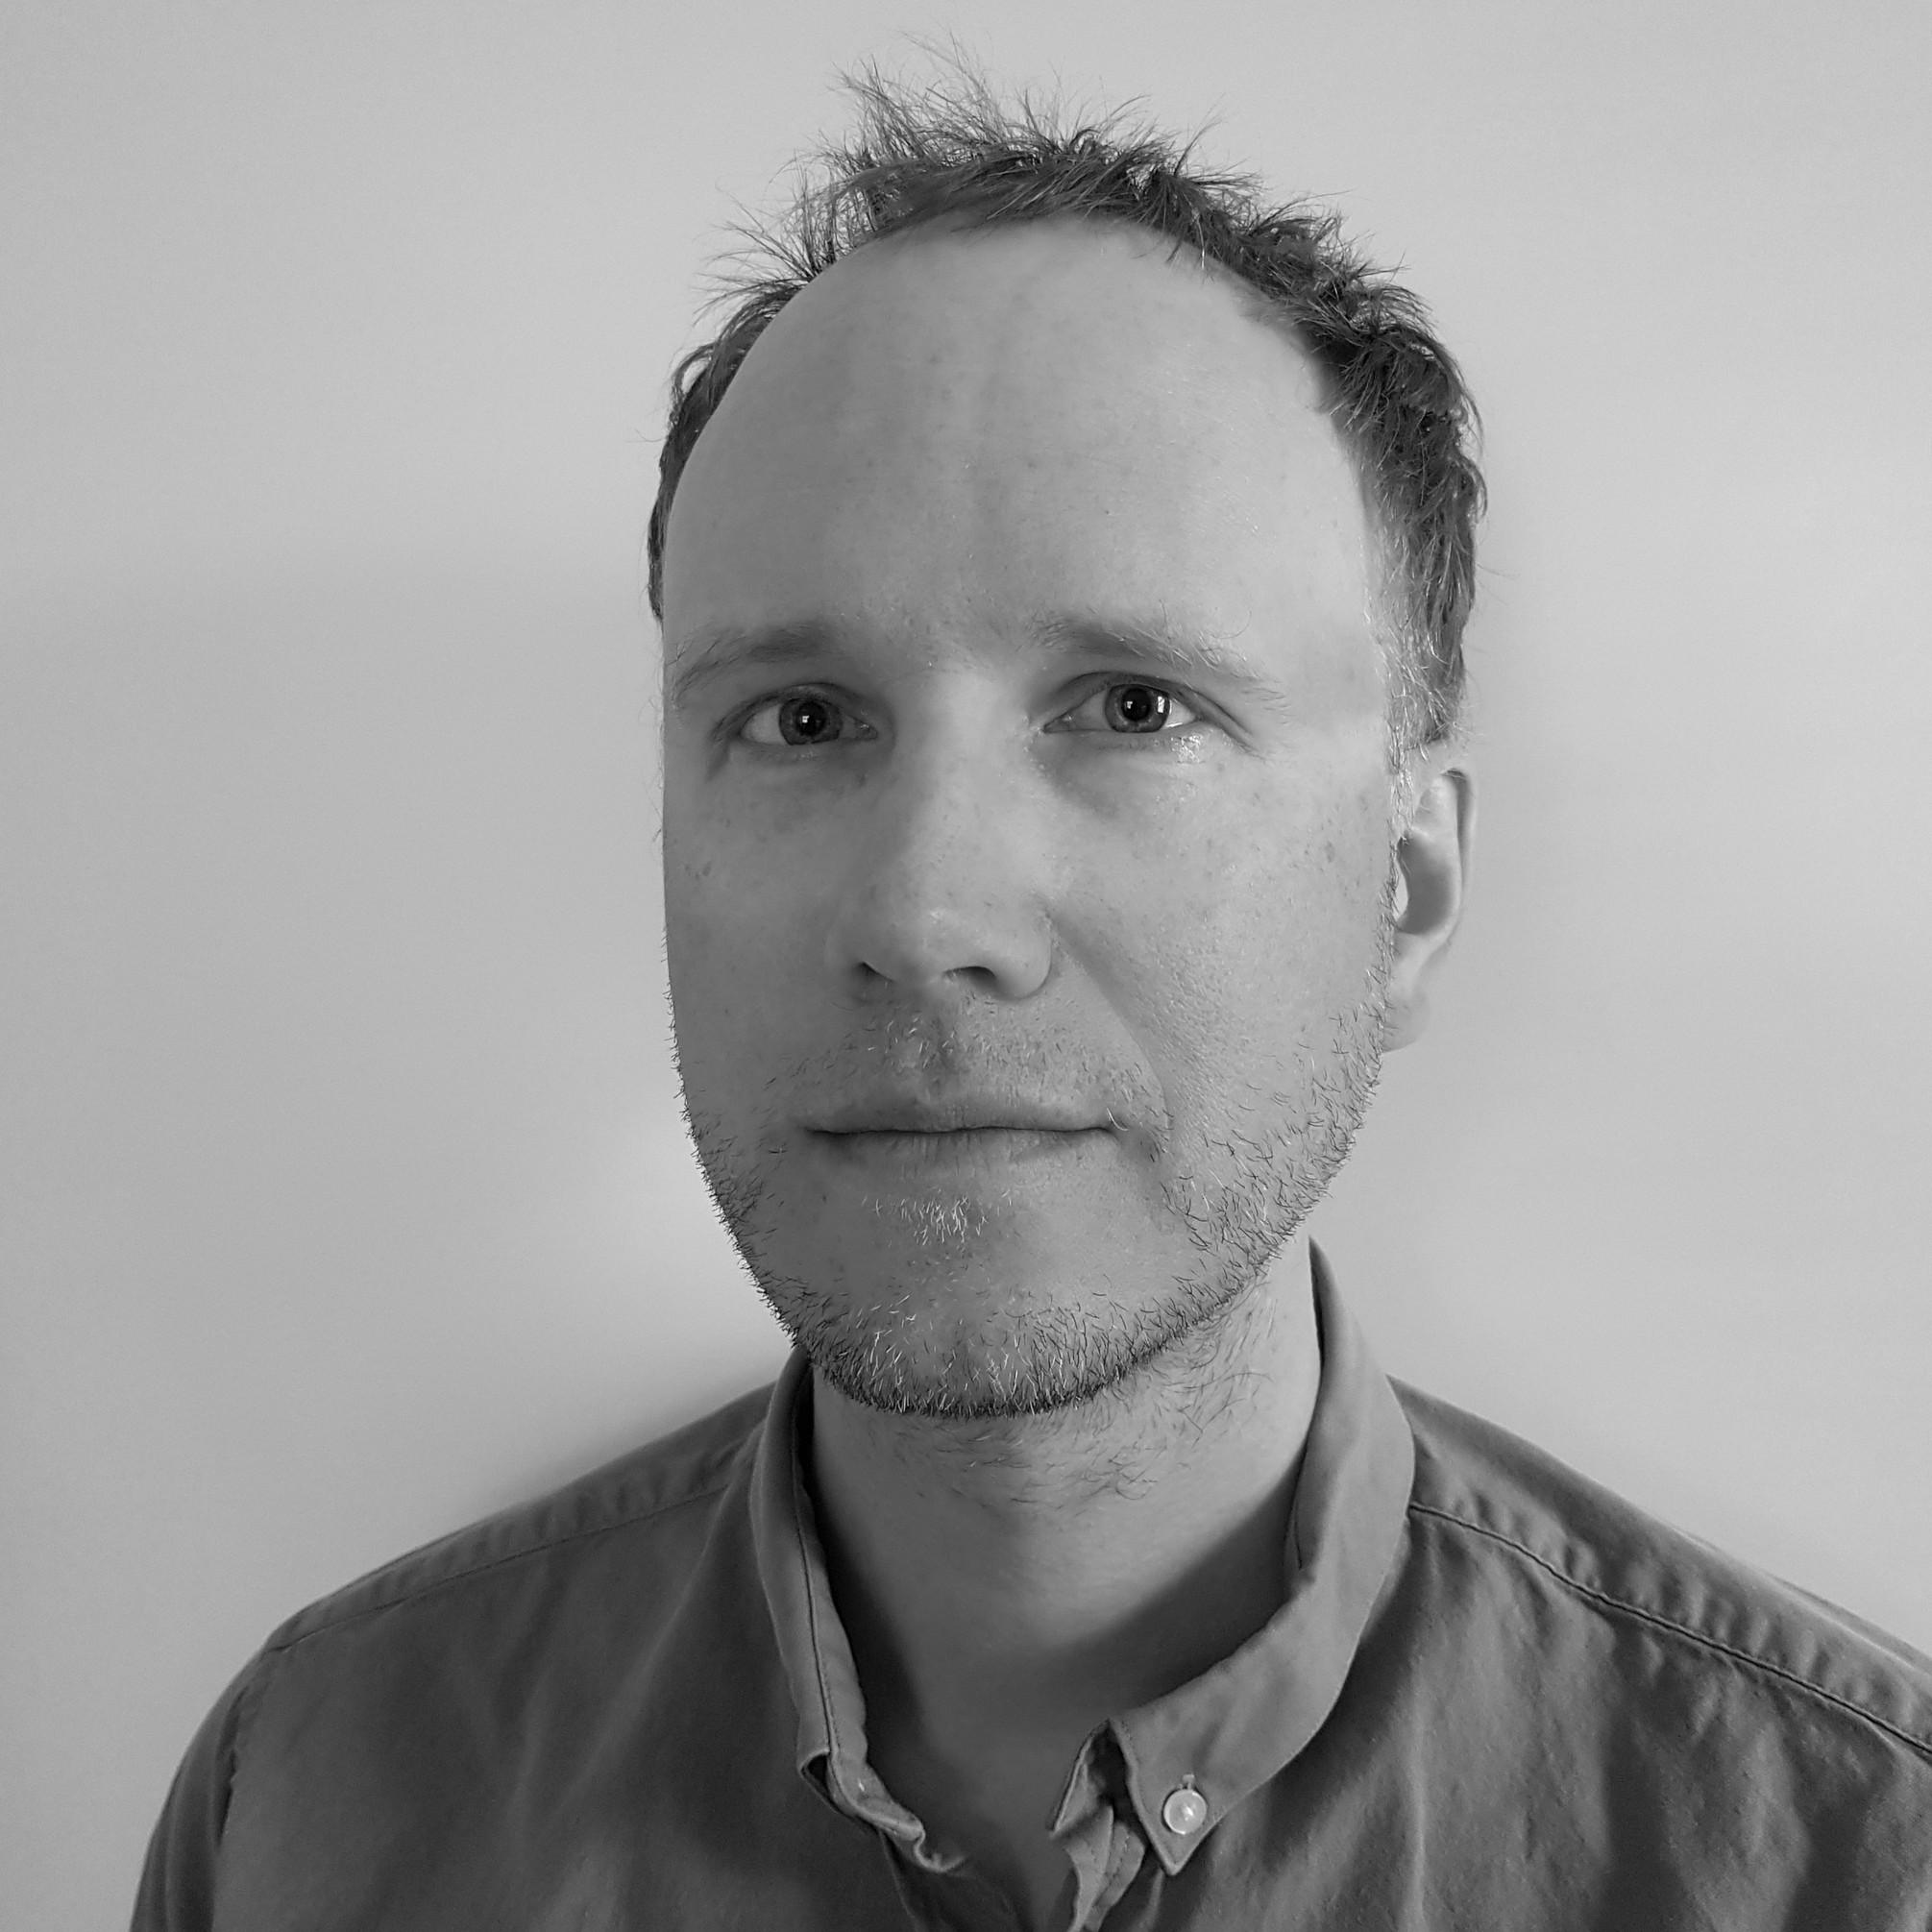 Mikko Majanen, VTT Technical Research Centre of Finland Ltd